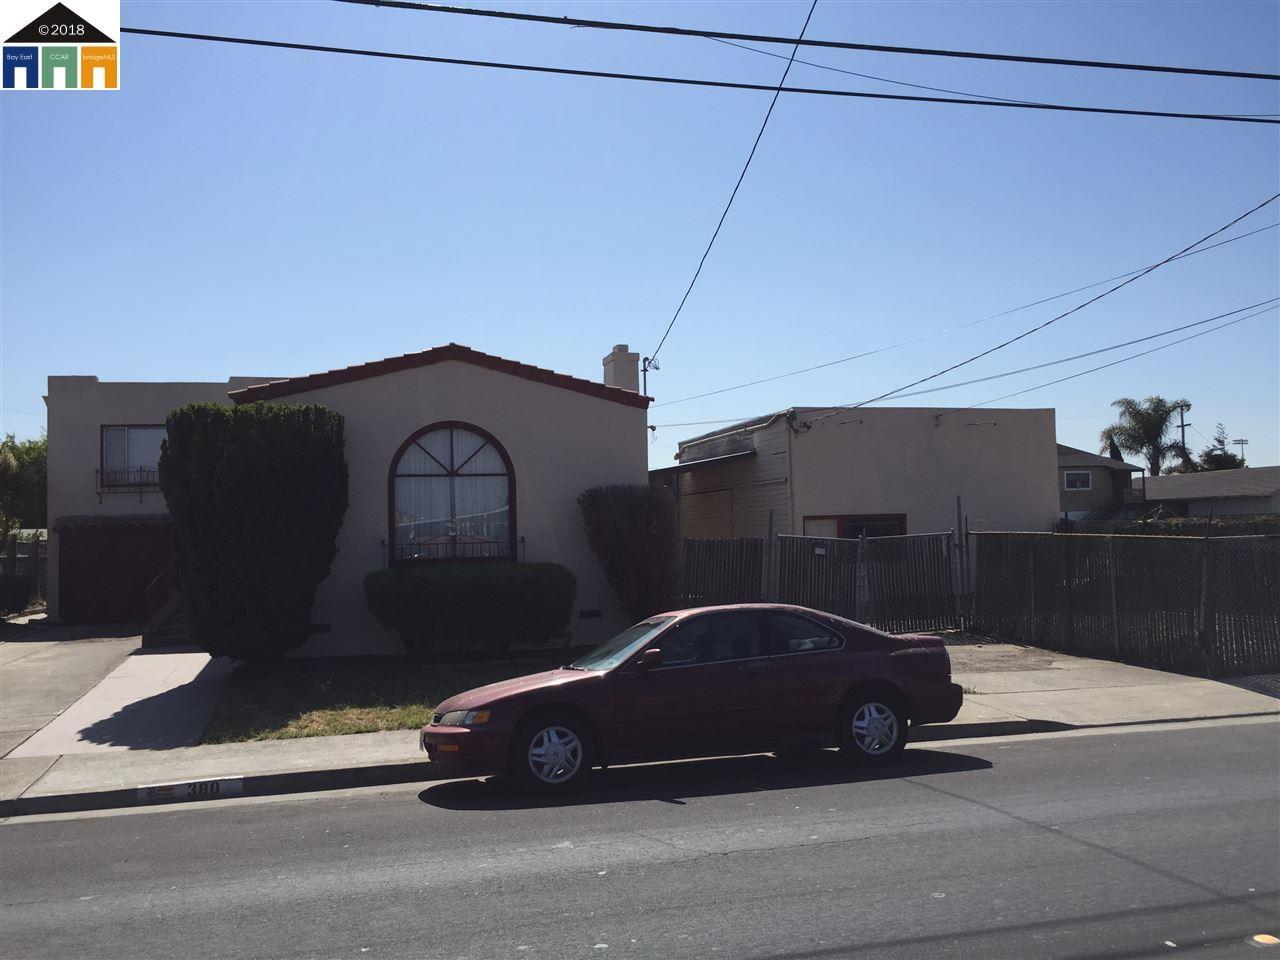 380 S 37TH, RICHMOND, CA 94801